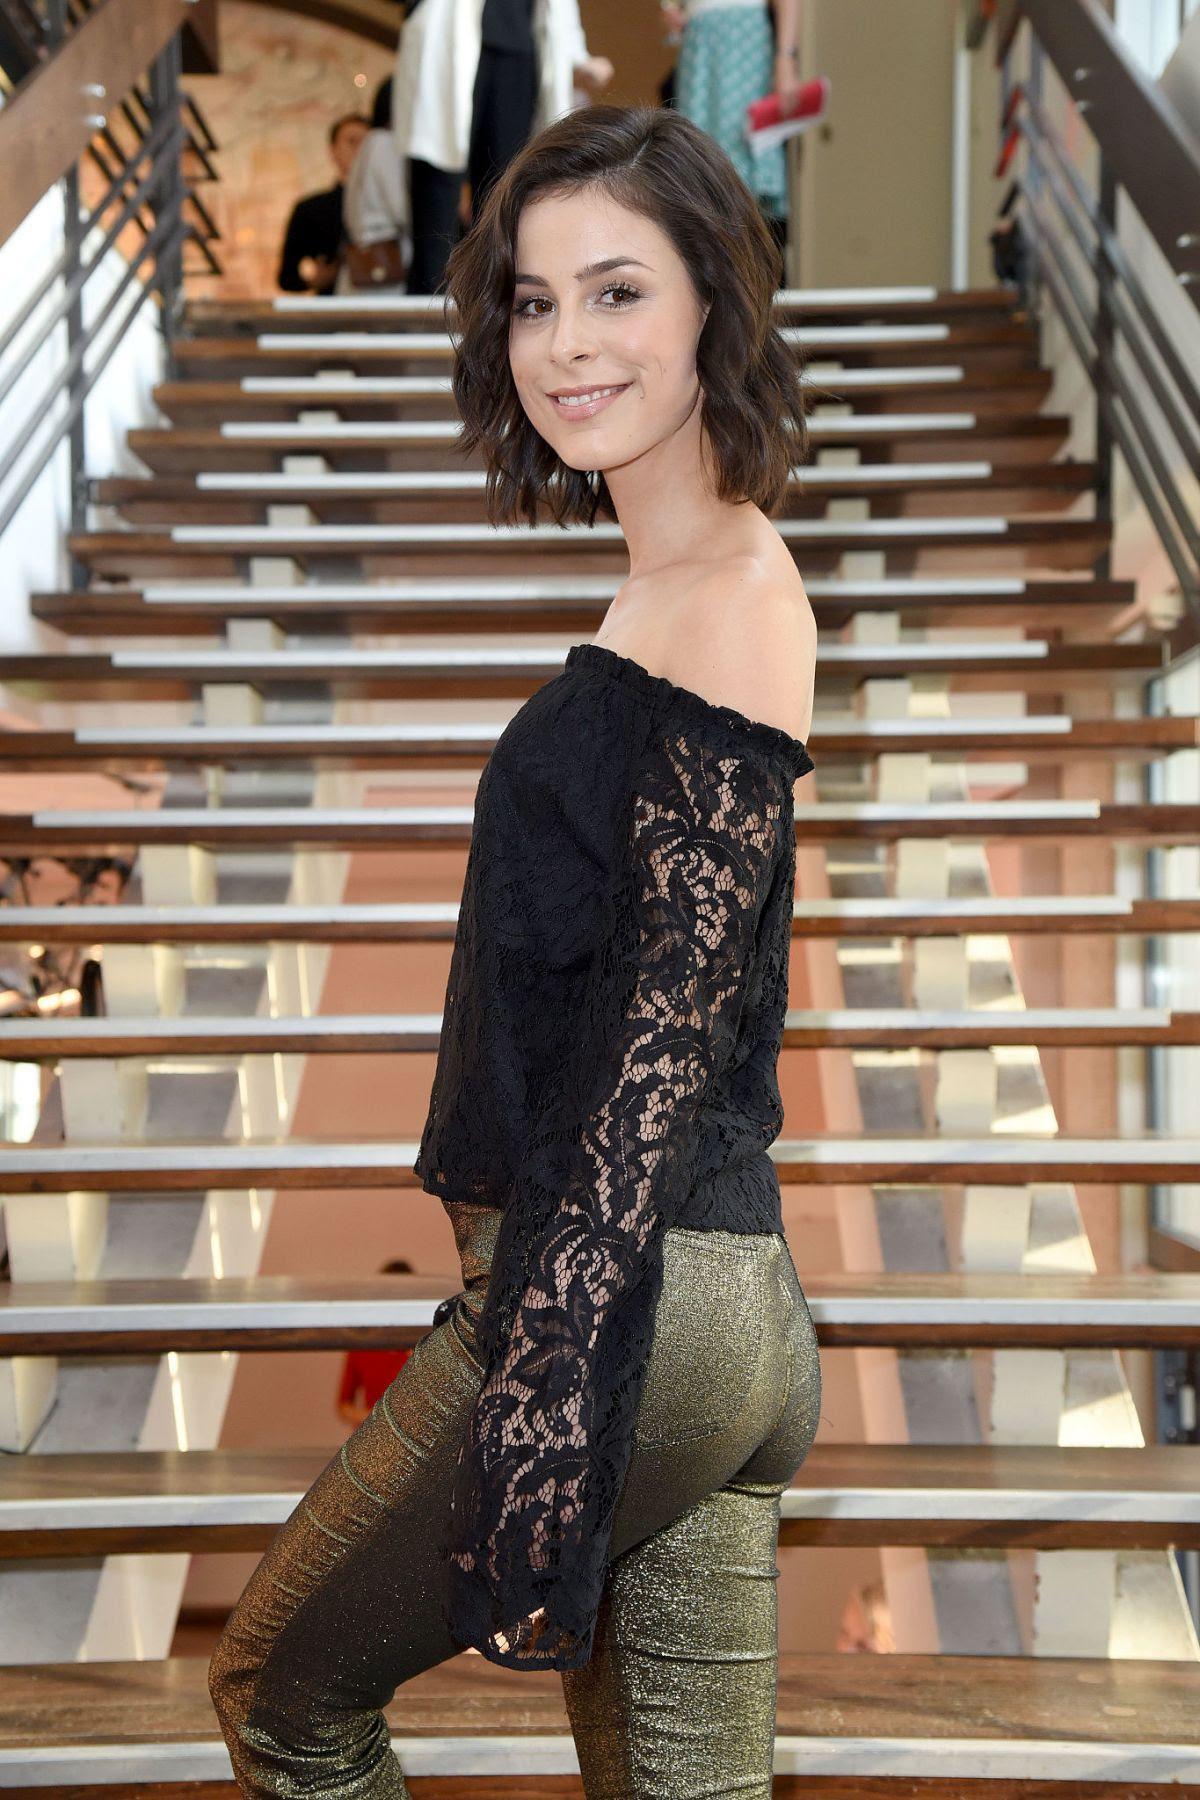 LENA MEYER-LANDRUT at 25 Years of DKMS in Berlin 05/27/2016